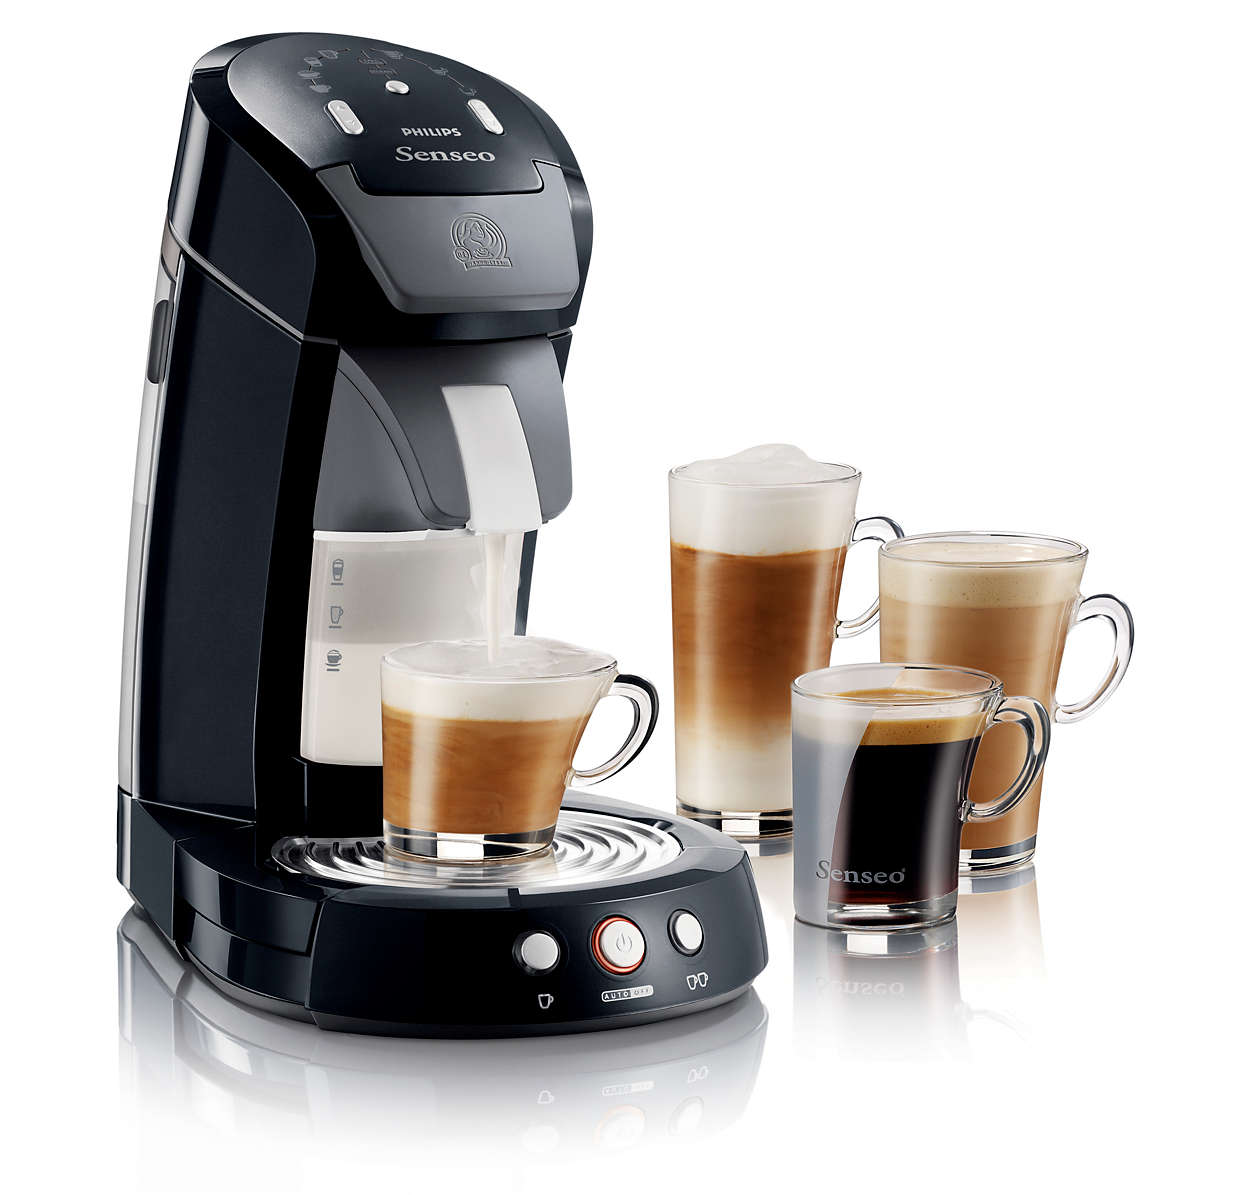 latte select machine caf dosettes hd7850 63 senseo. Black Bedroom Furniture Sets. Home Design Ideas